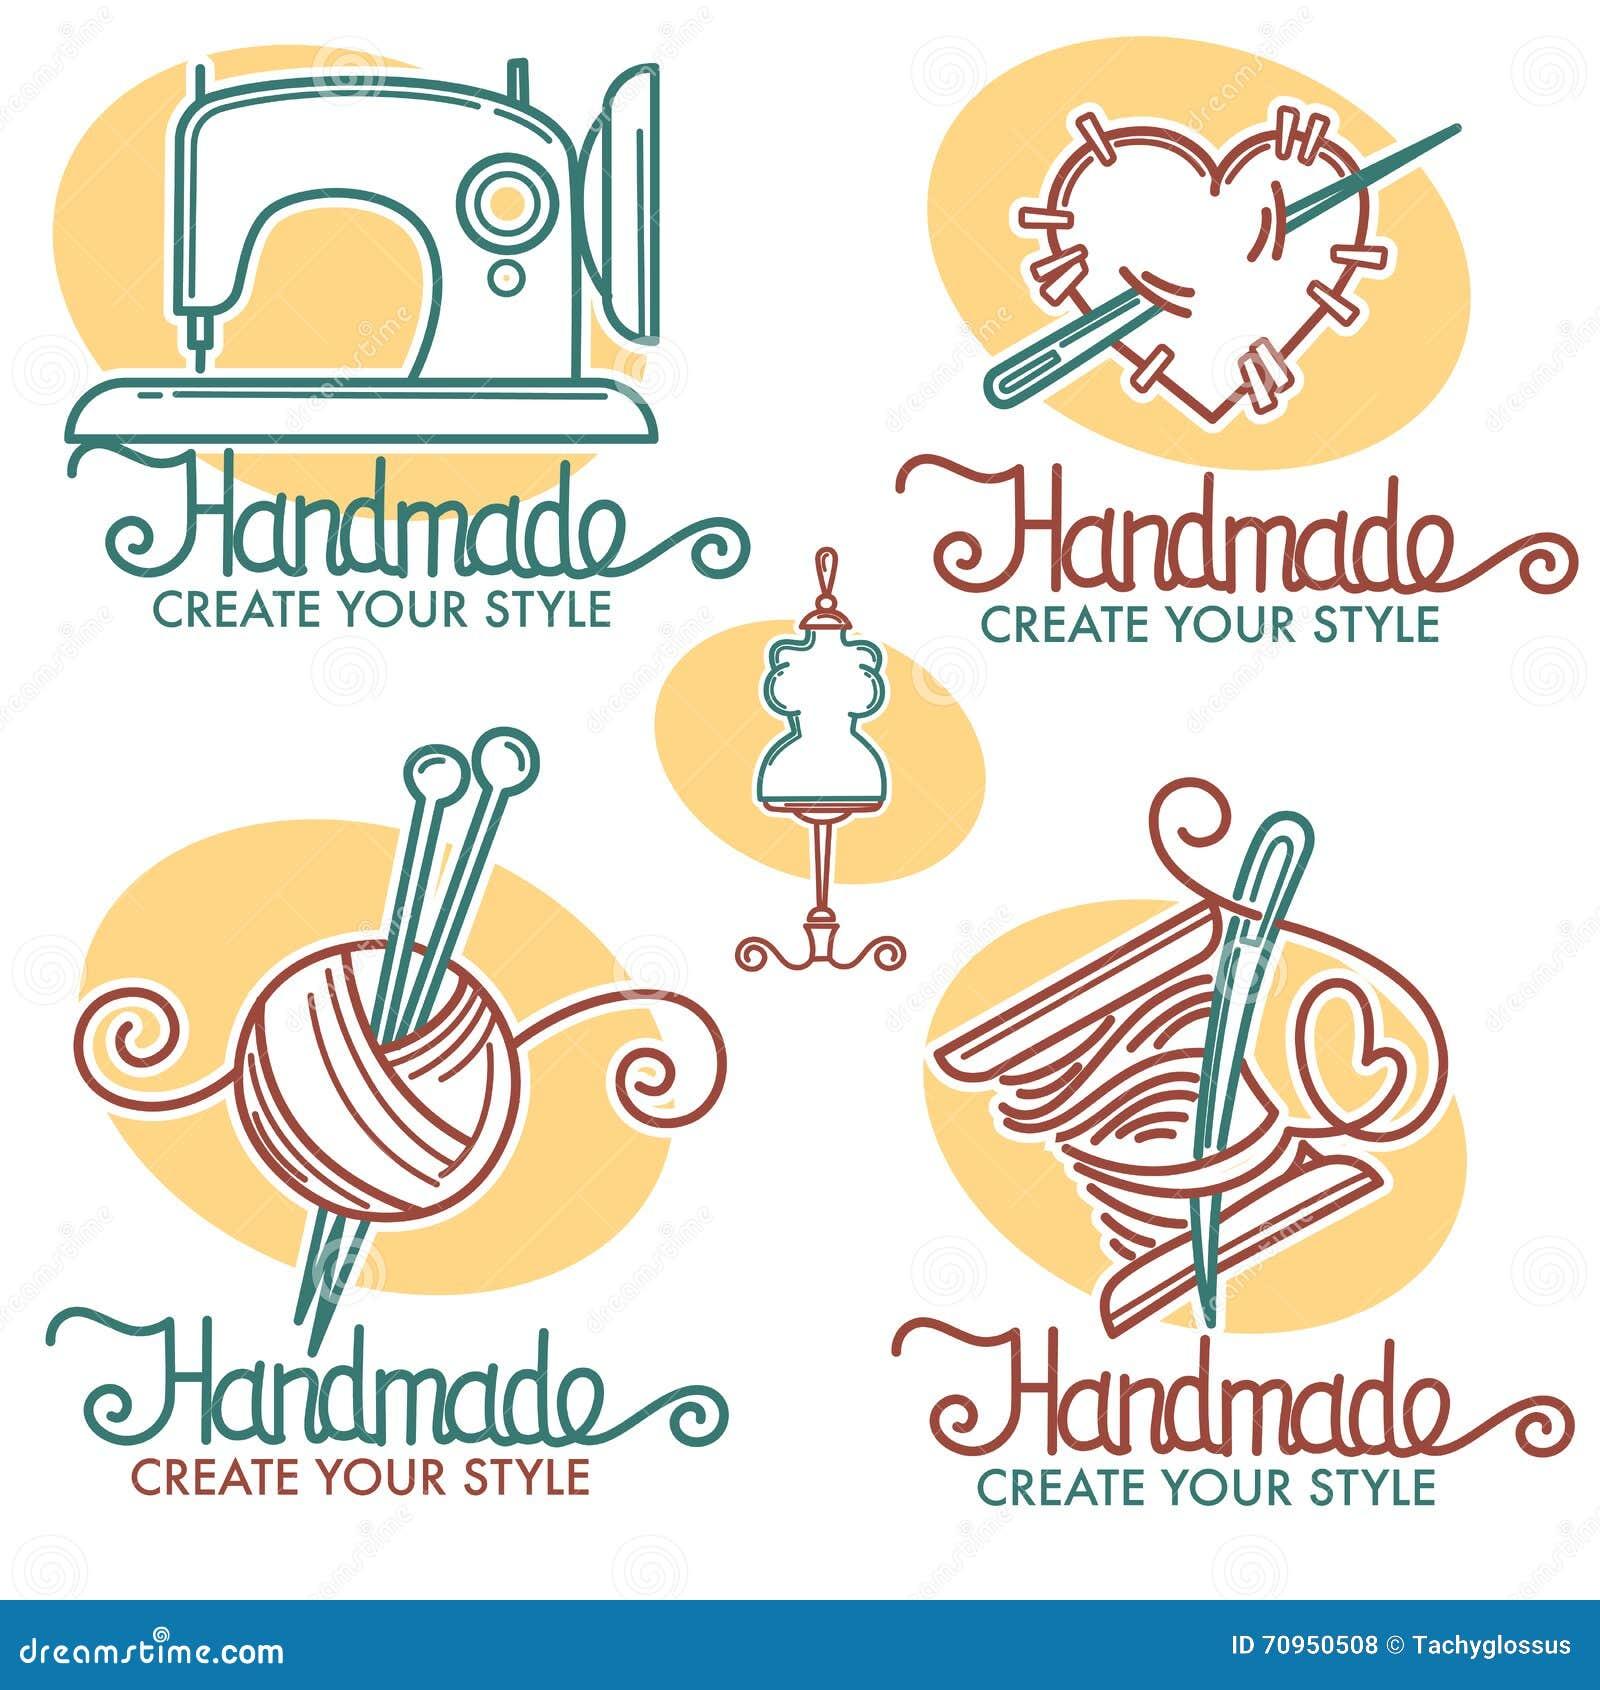 Handmade Logo Stock Vector Image 70950508